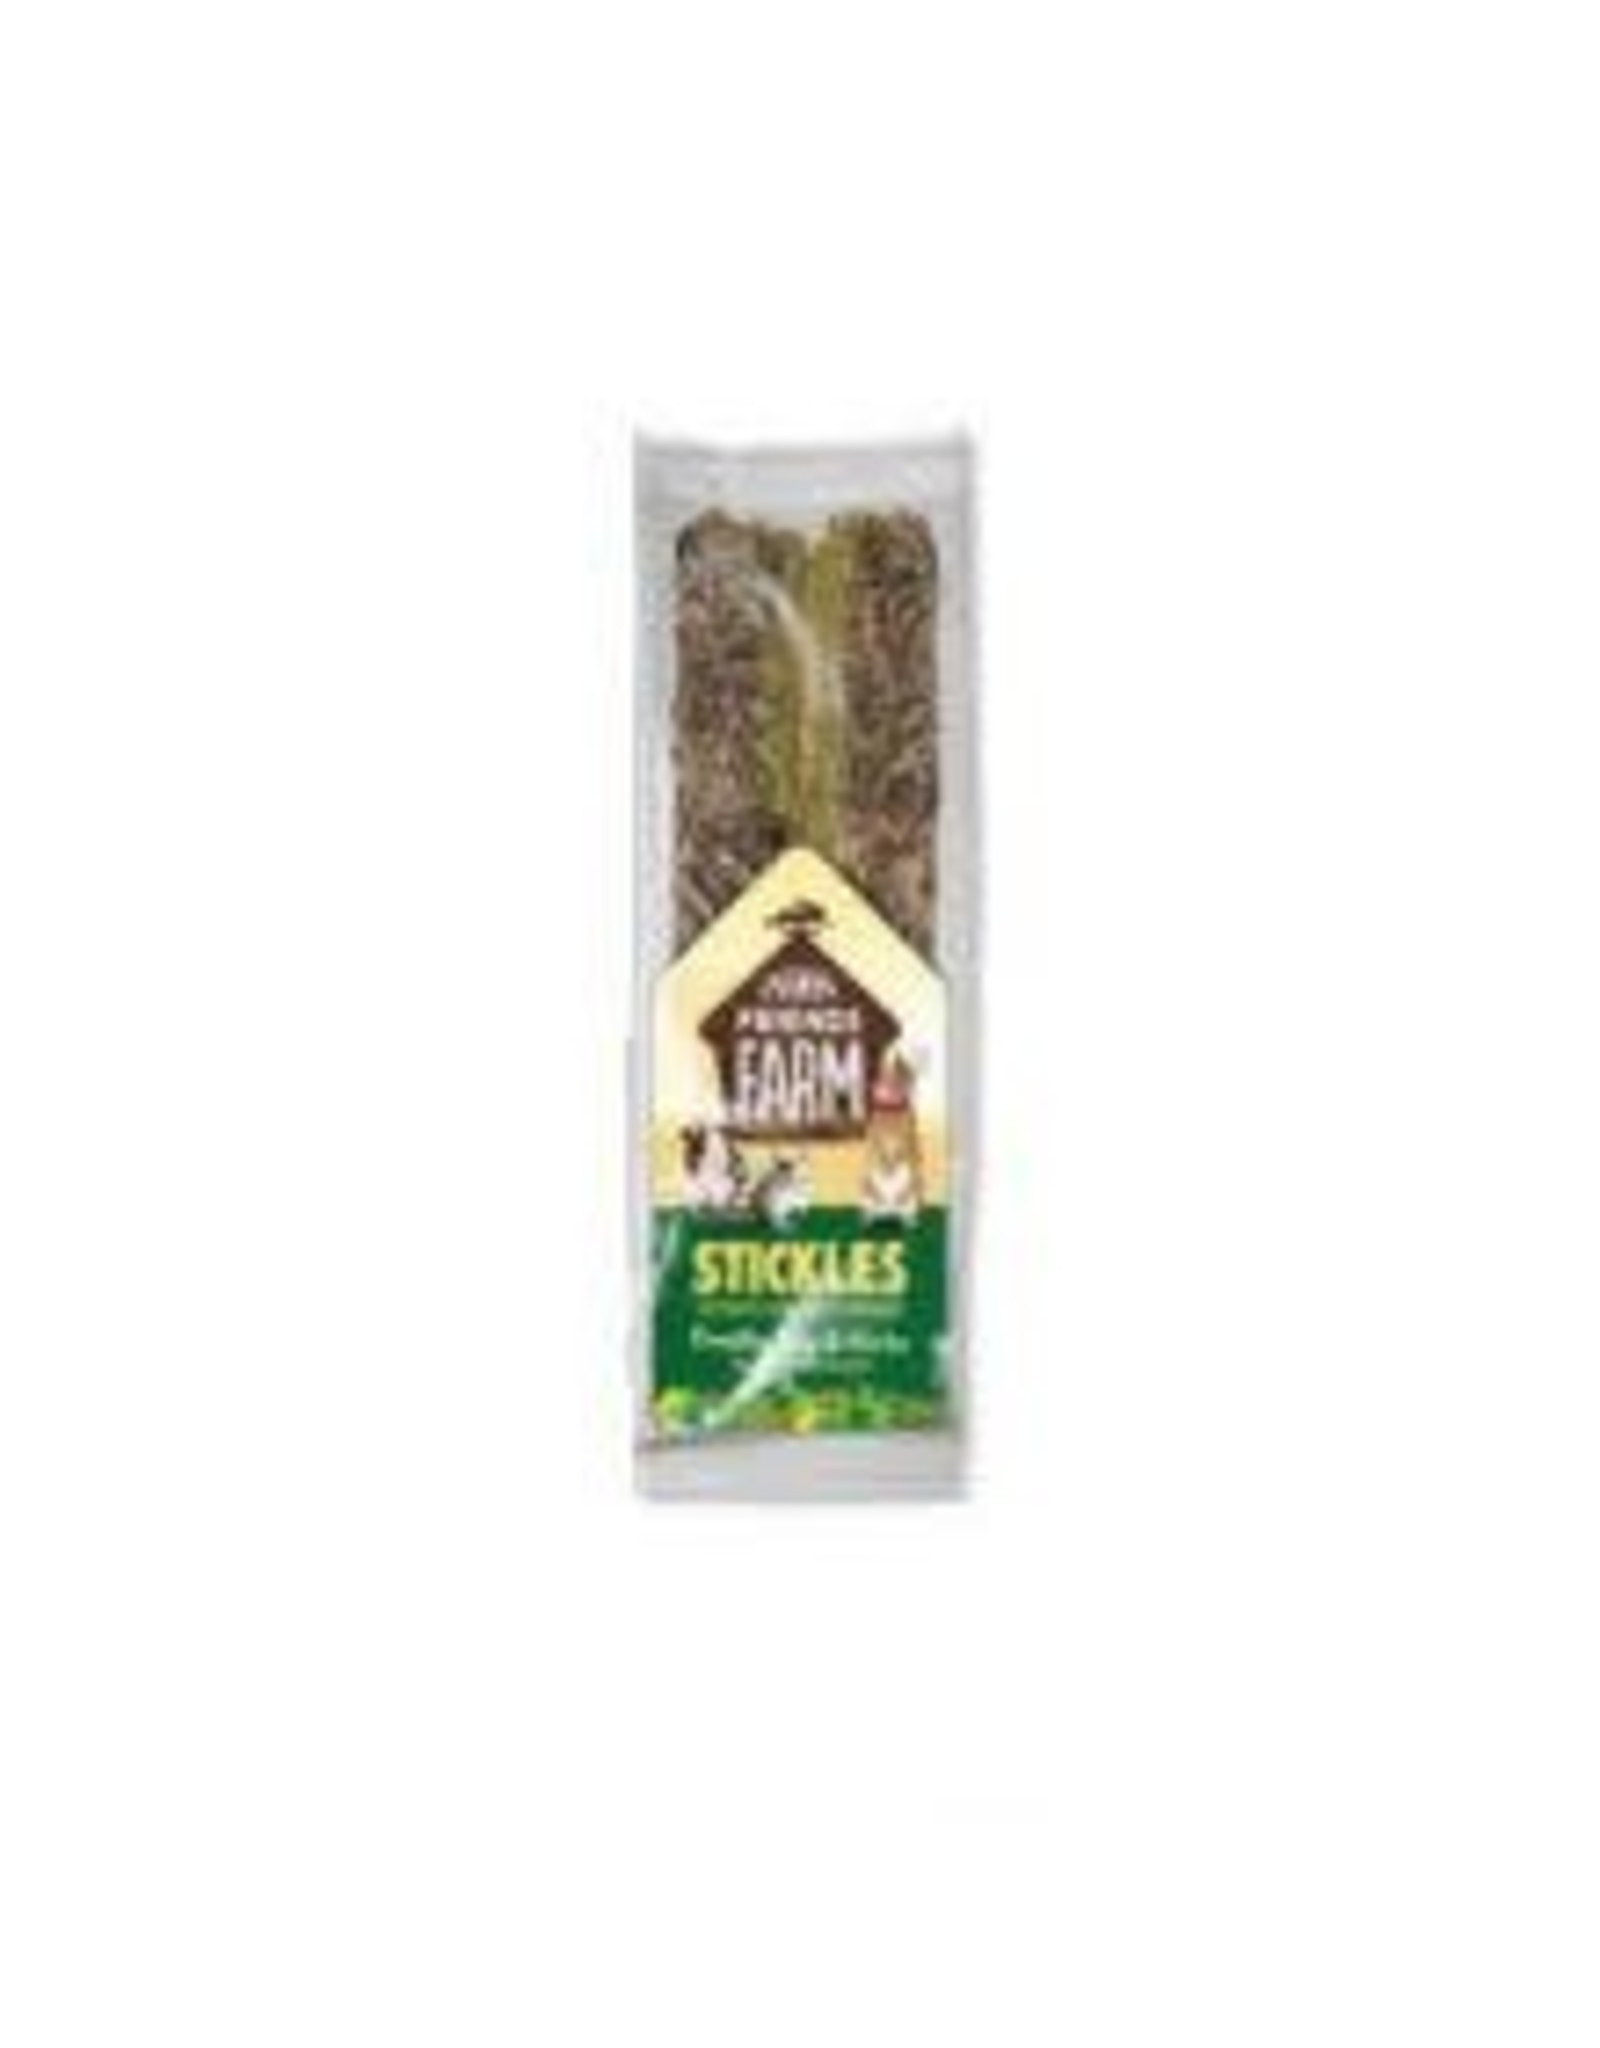 Supreme Stickles Timothy Hay & Herbs 2 Sticks